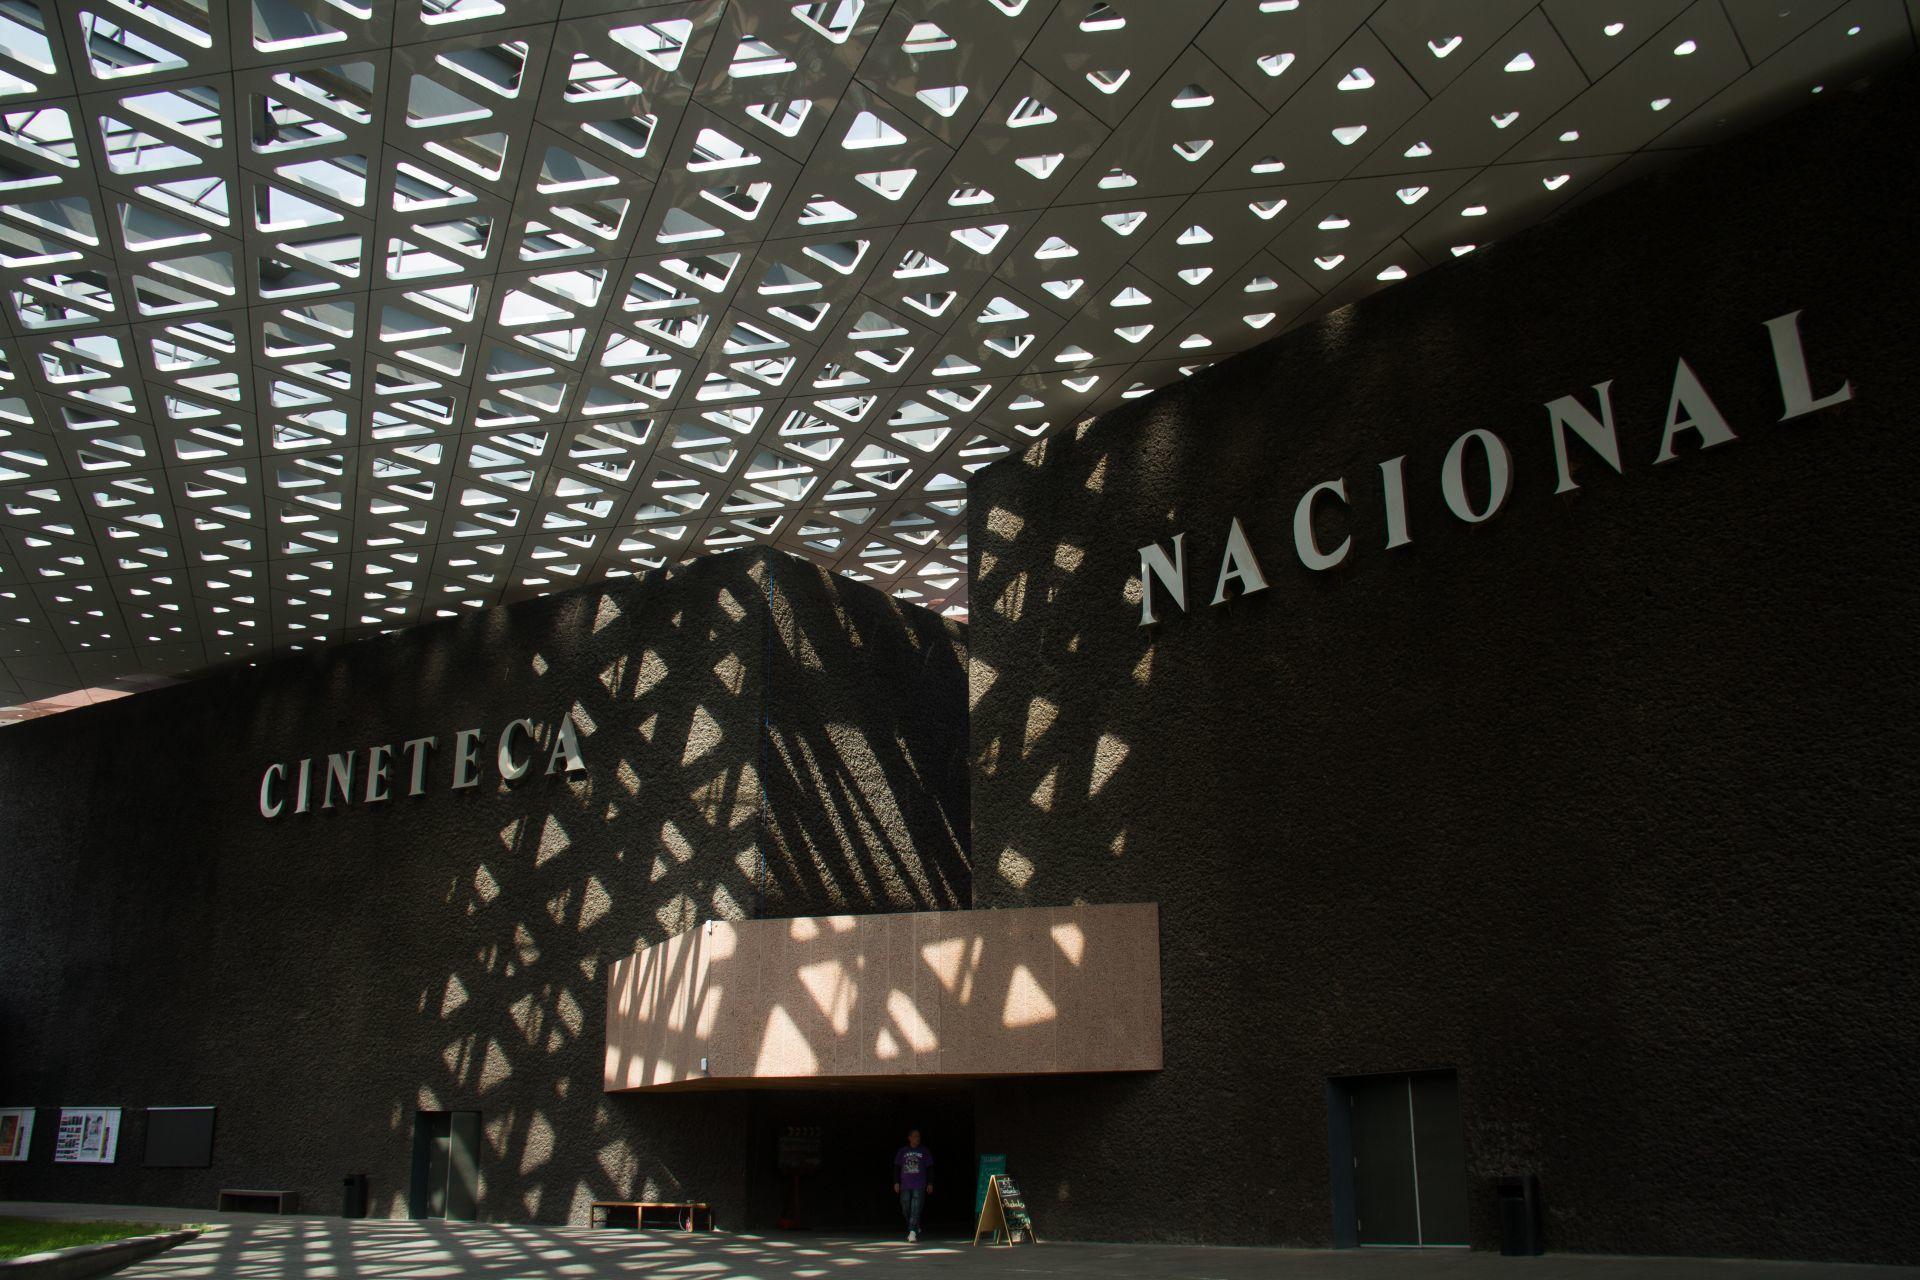 Cineteca regresa: abre foro al aire libre con cine mexicano